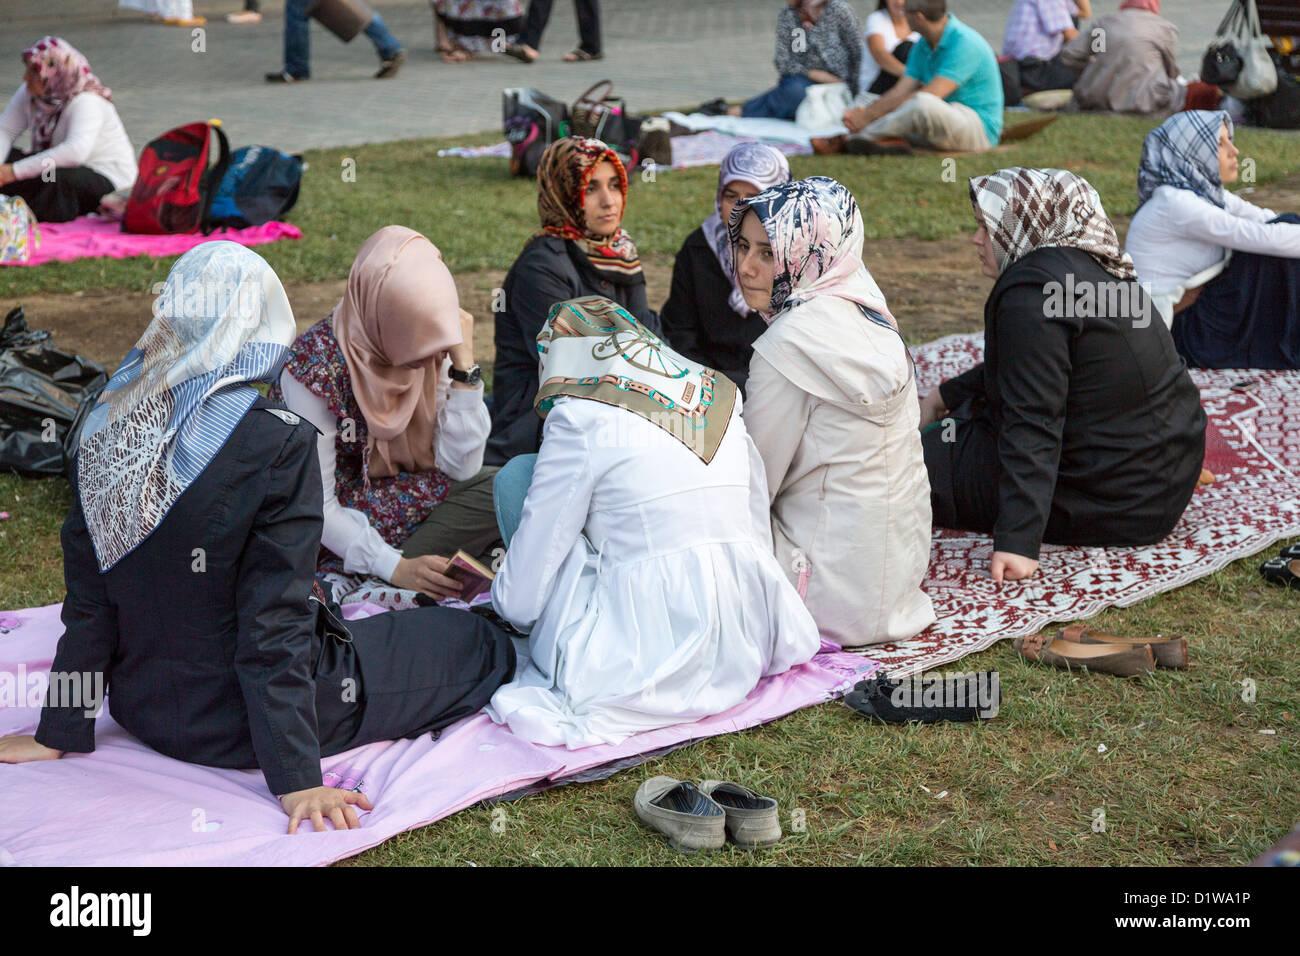 Muslim women awaiting sunset at Ramadan, Sultan Ahmet Square Istanbul, Turkey - Stock Image